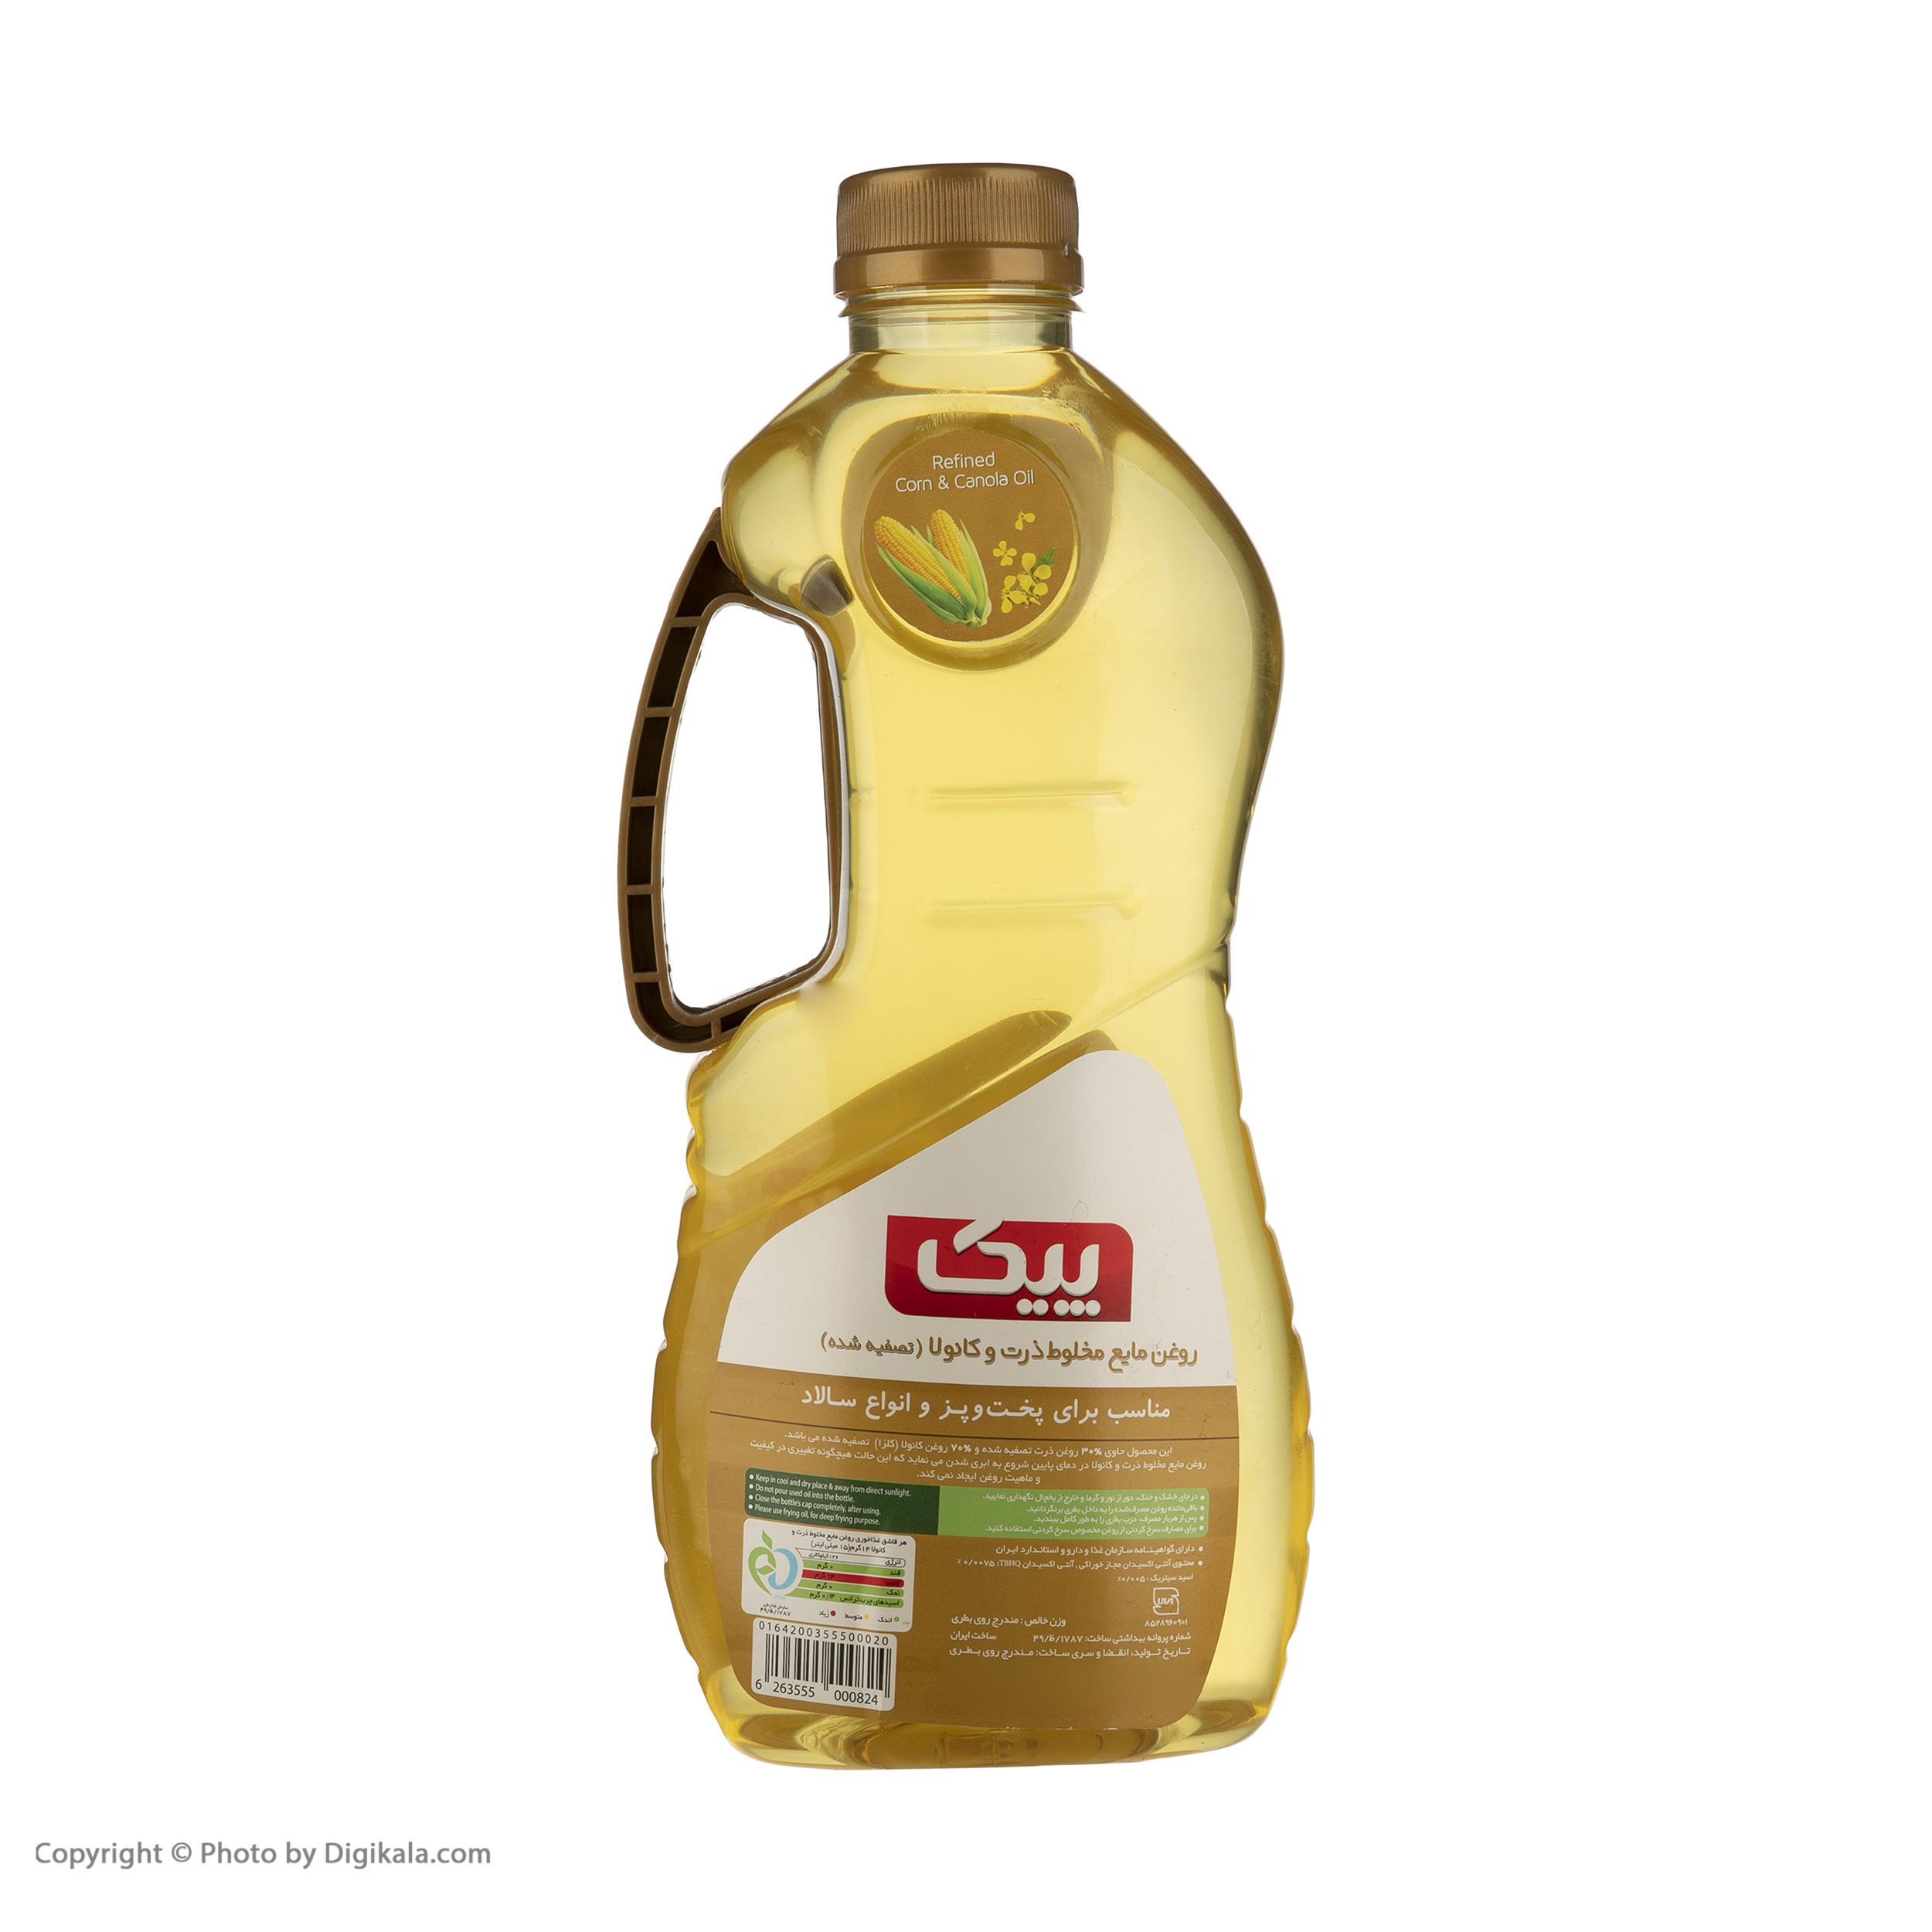 روغن ذرت و کانولا پیک - 1.8 لیتر